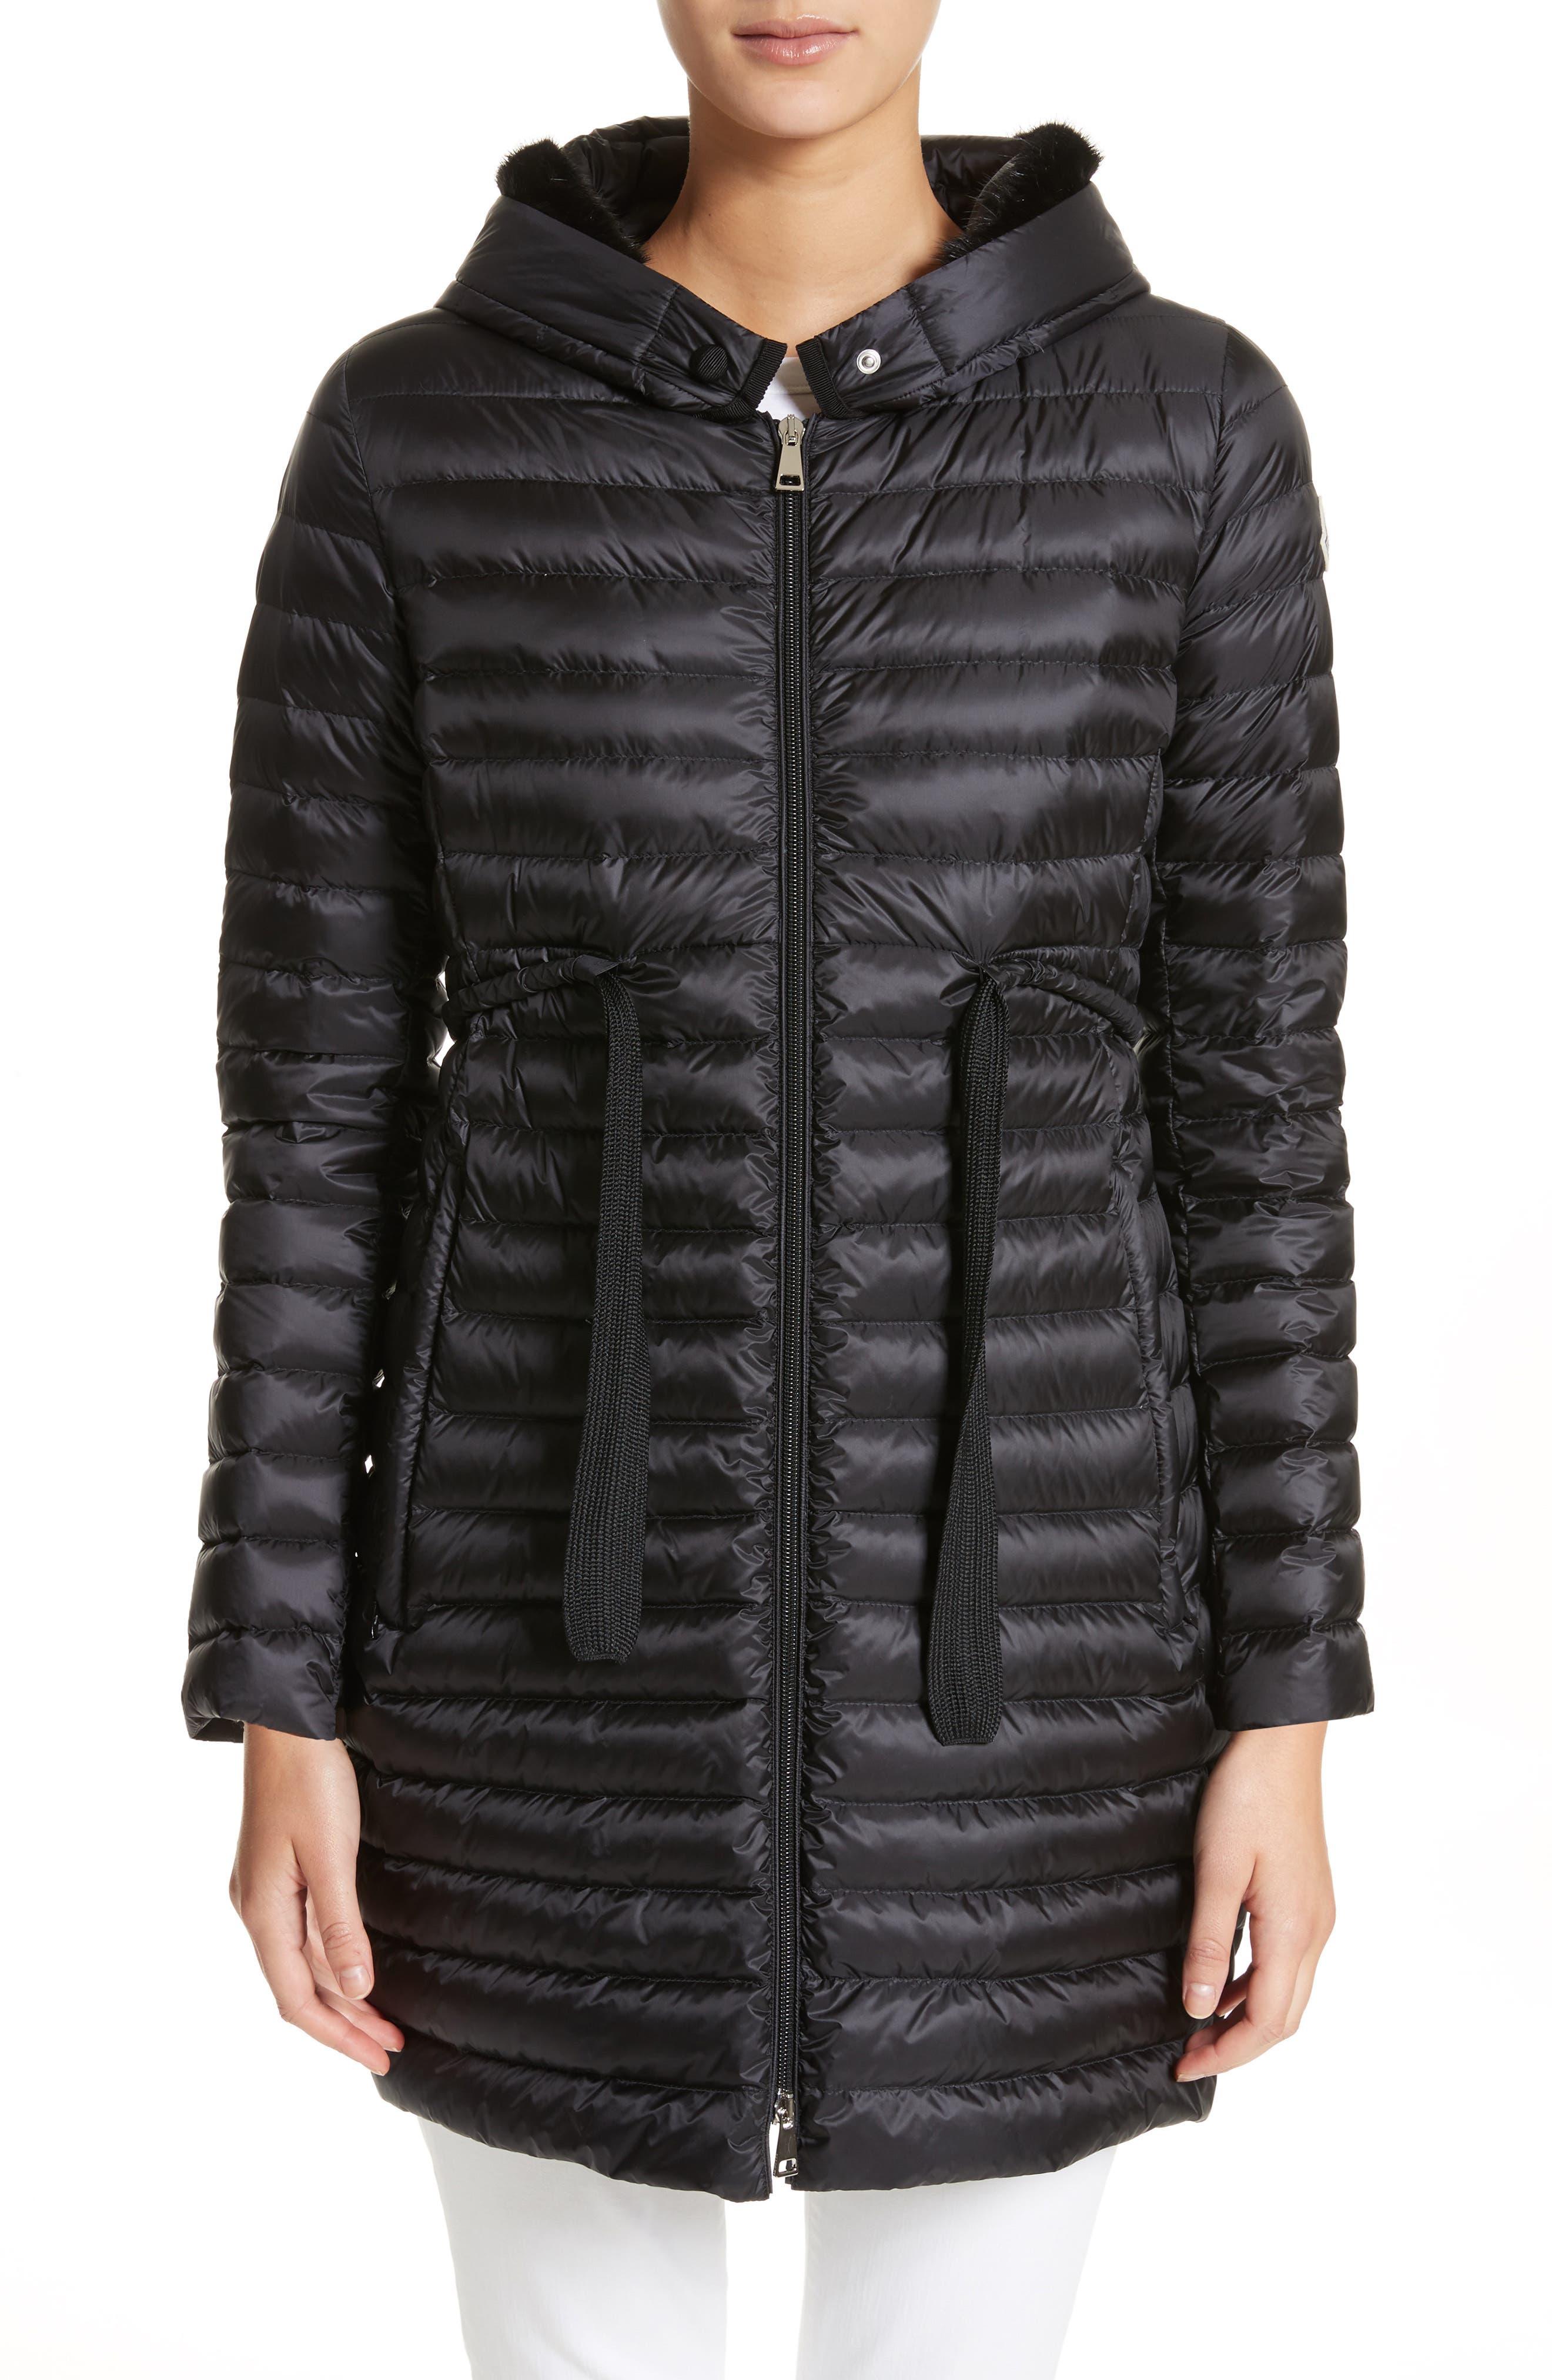 Barbel Hooded Down Coat with Genuine Mink Fur Trim,                         Main,                         color, Black